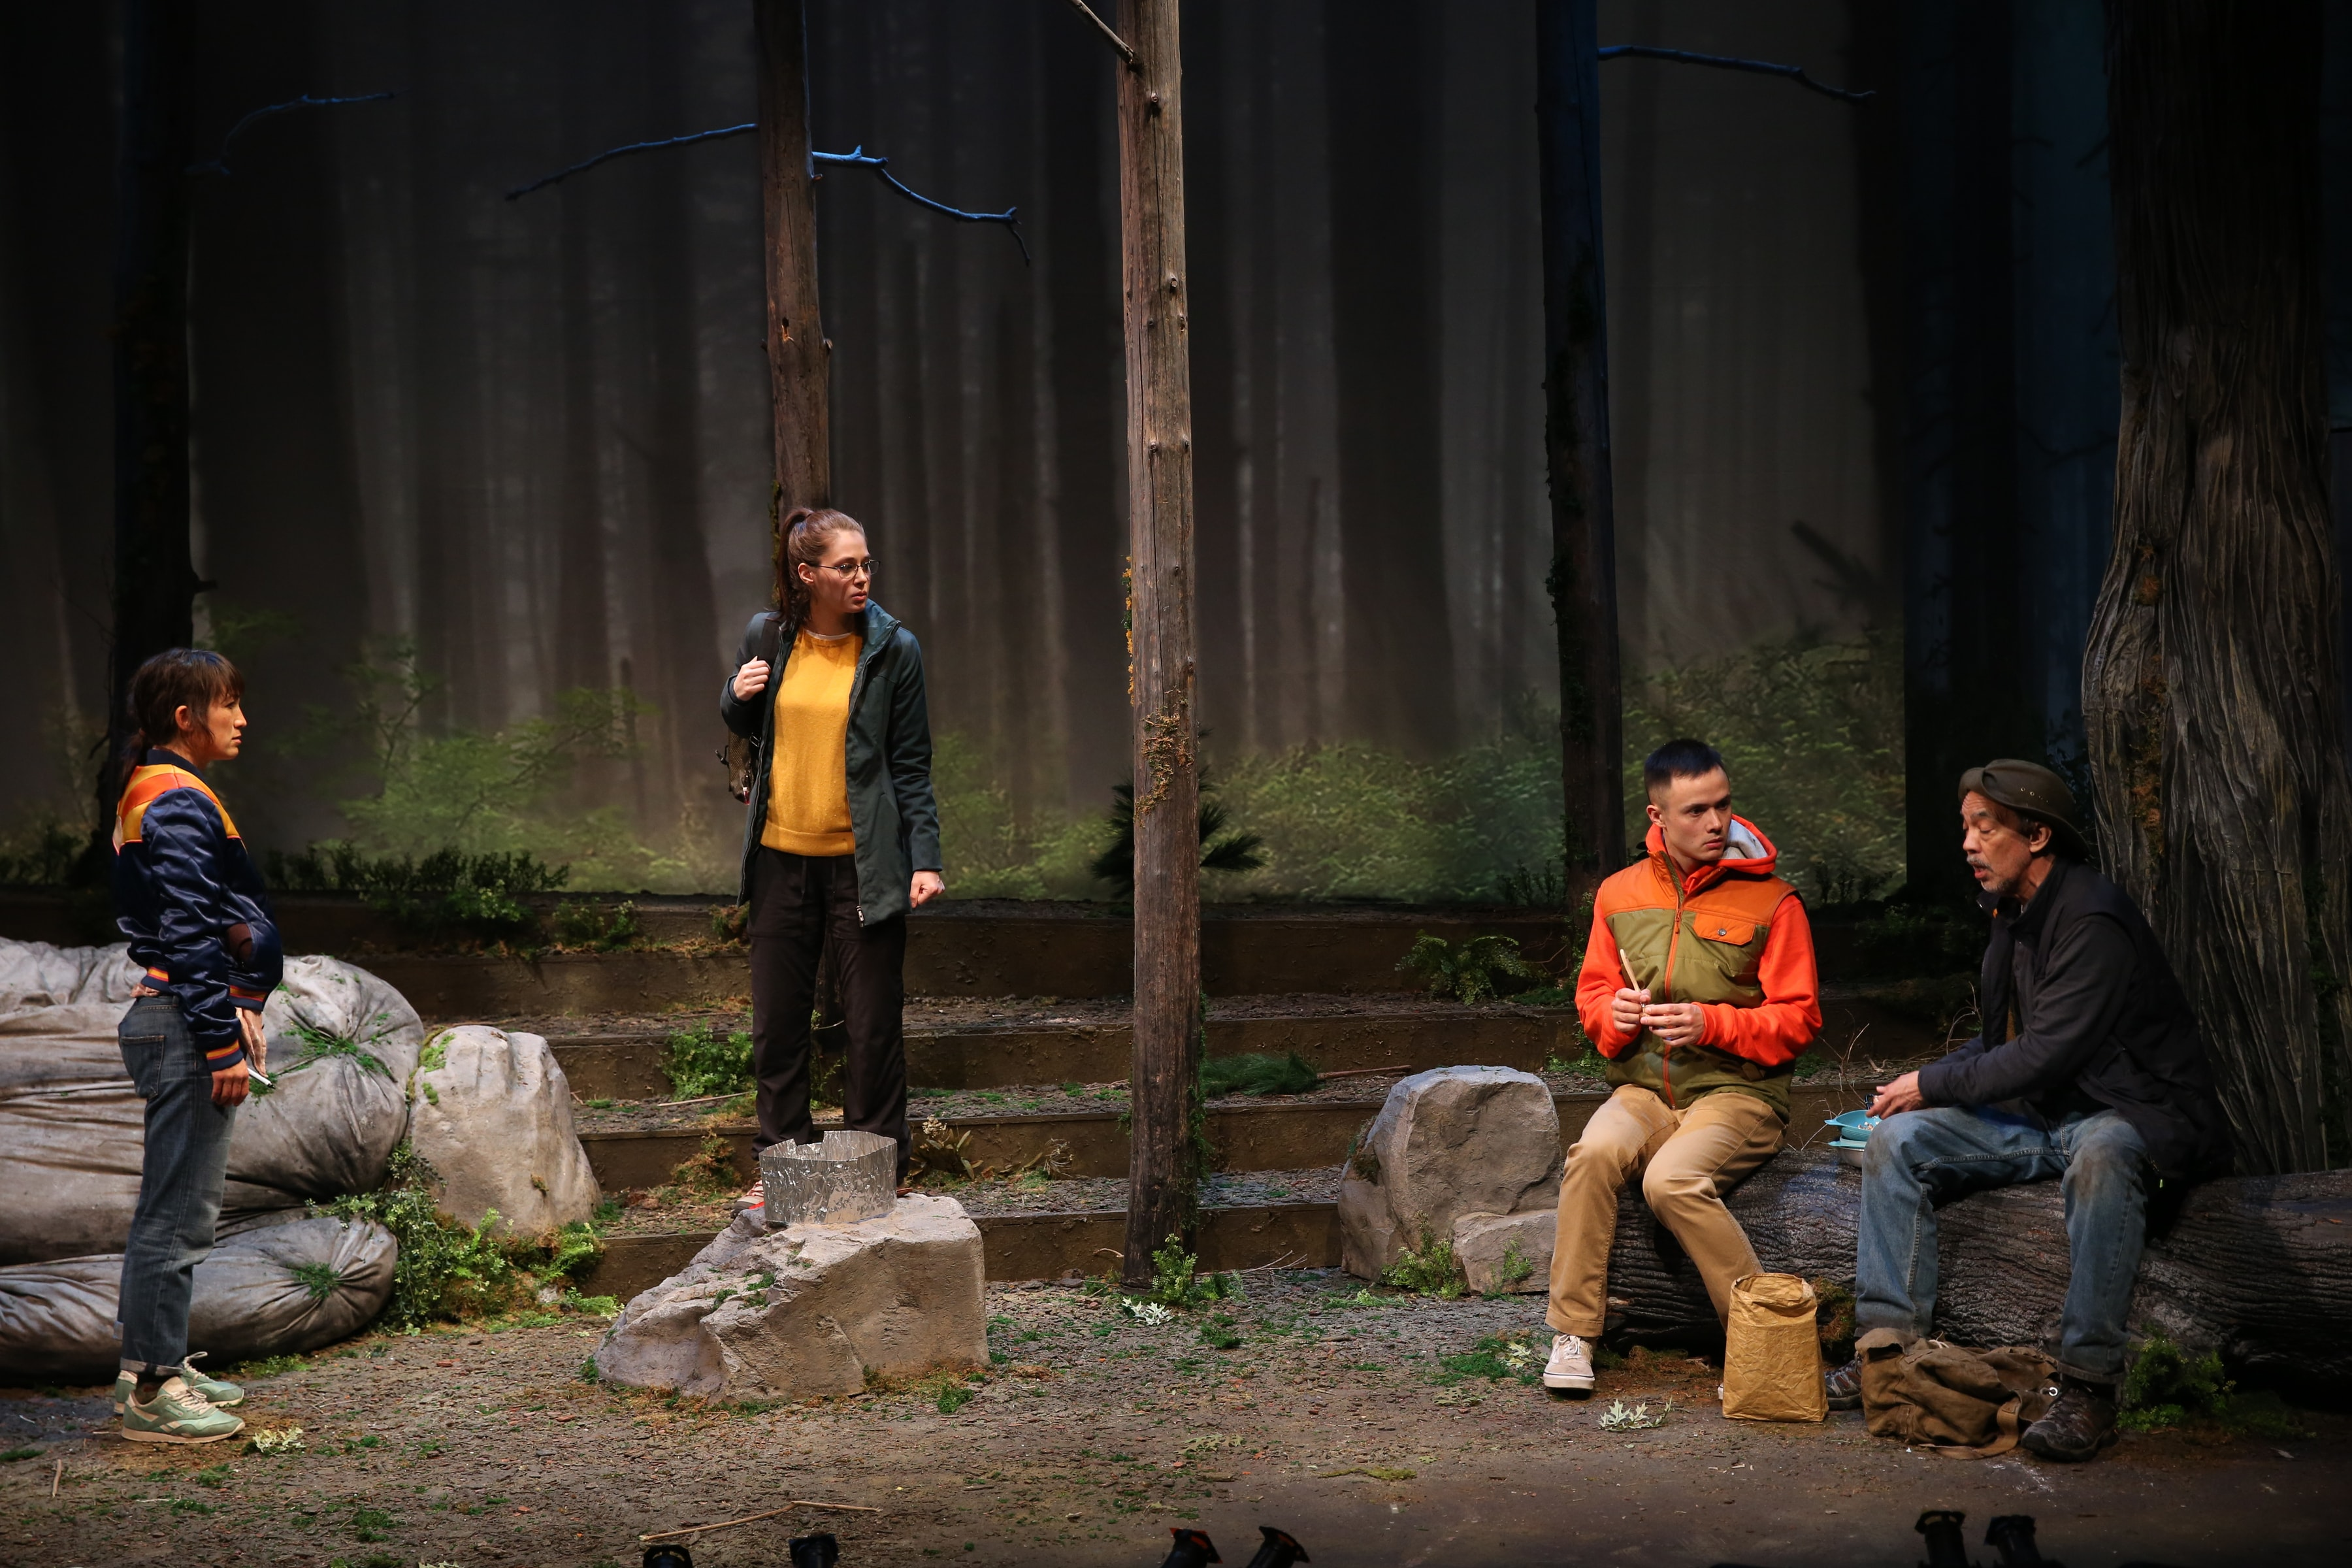 Kimiya Corwin, Emma Kikue, Jeffrey Omura, and Thom Sesma in <i>Fruiting Bodies</i>. (Photo: Carol Rosegg)